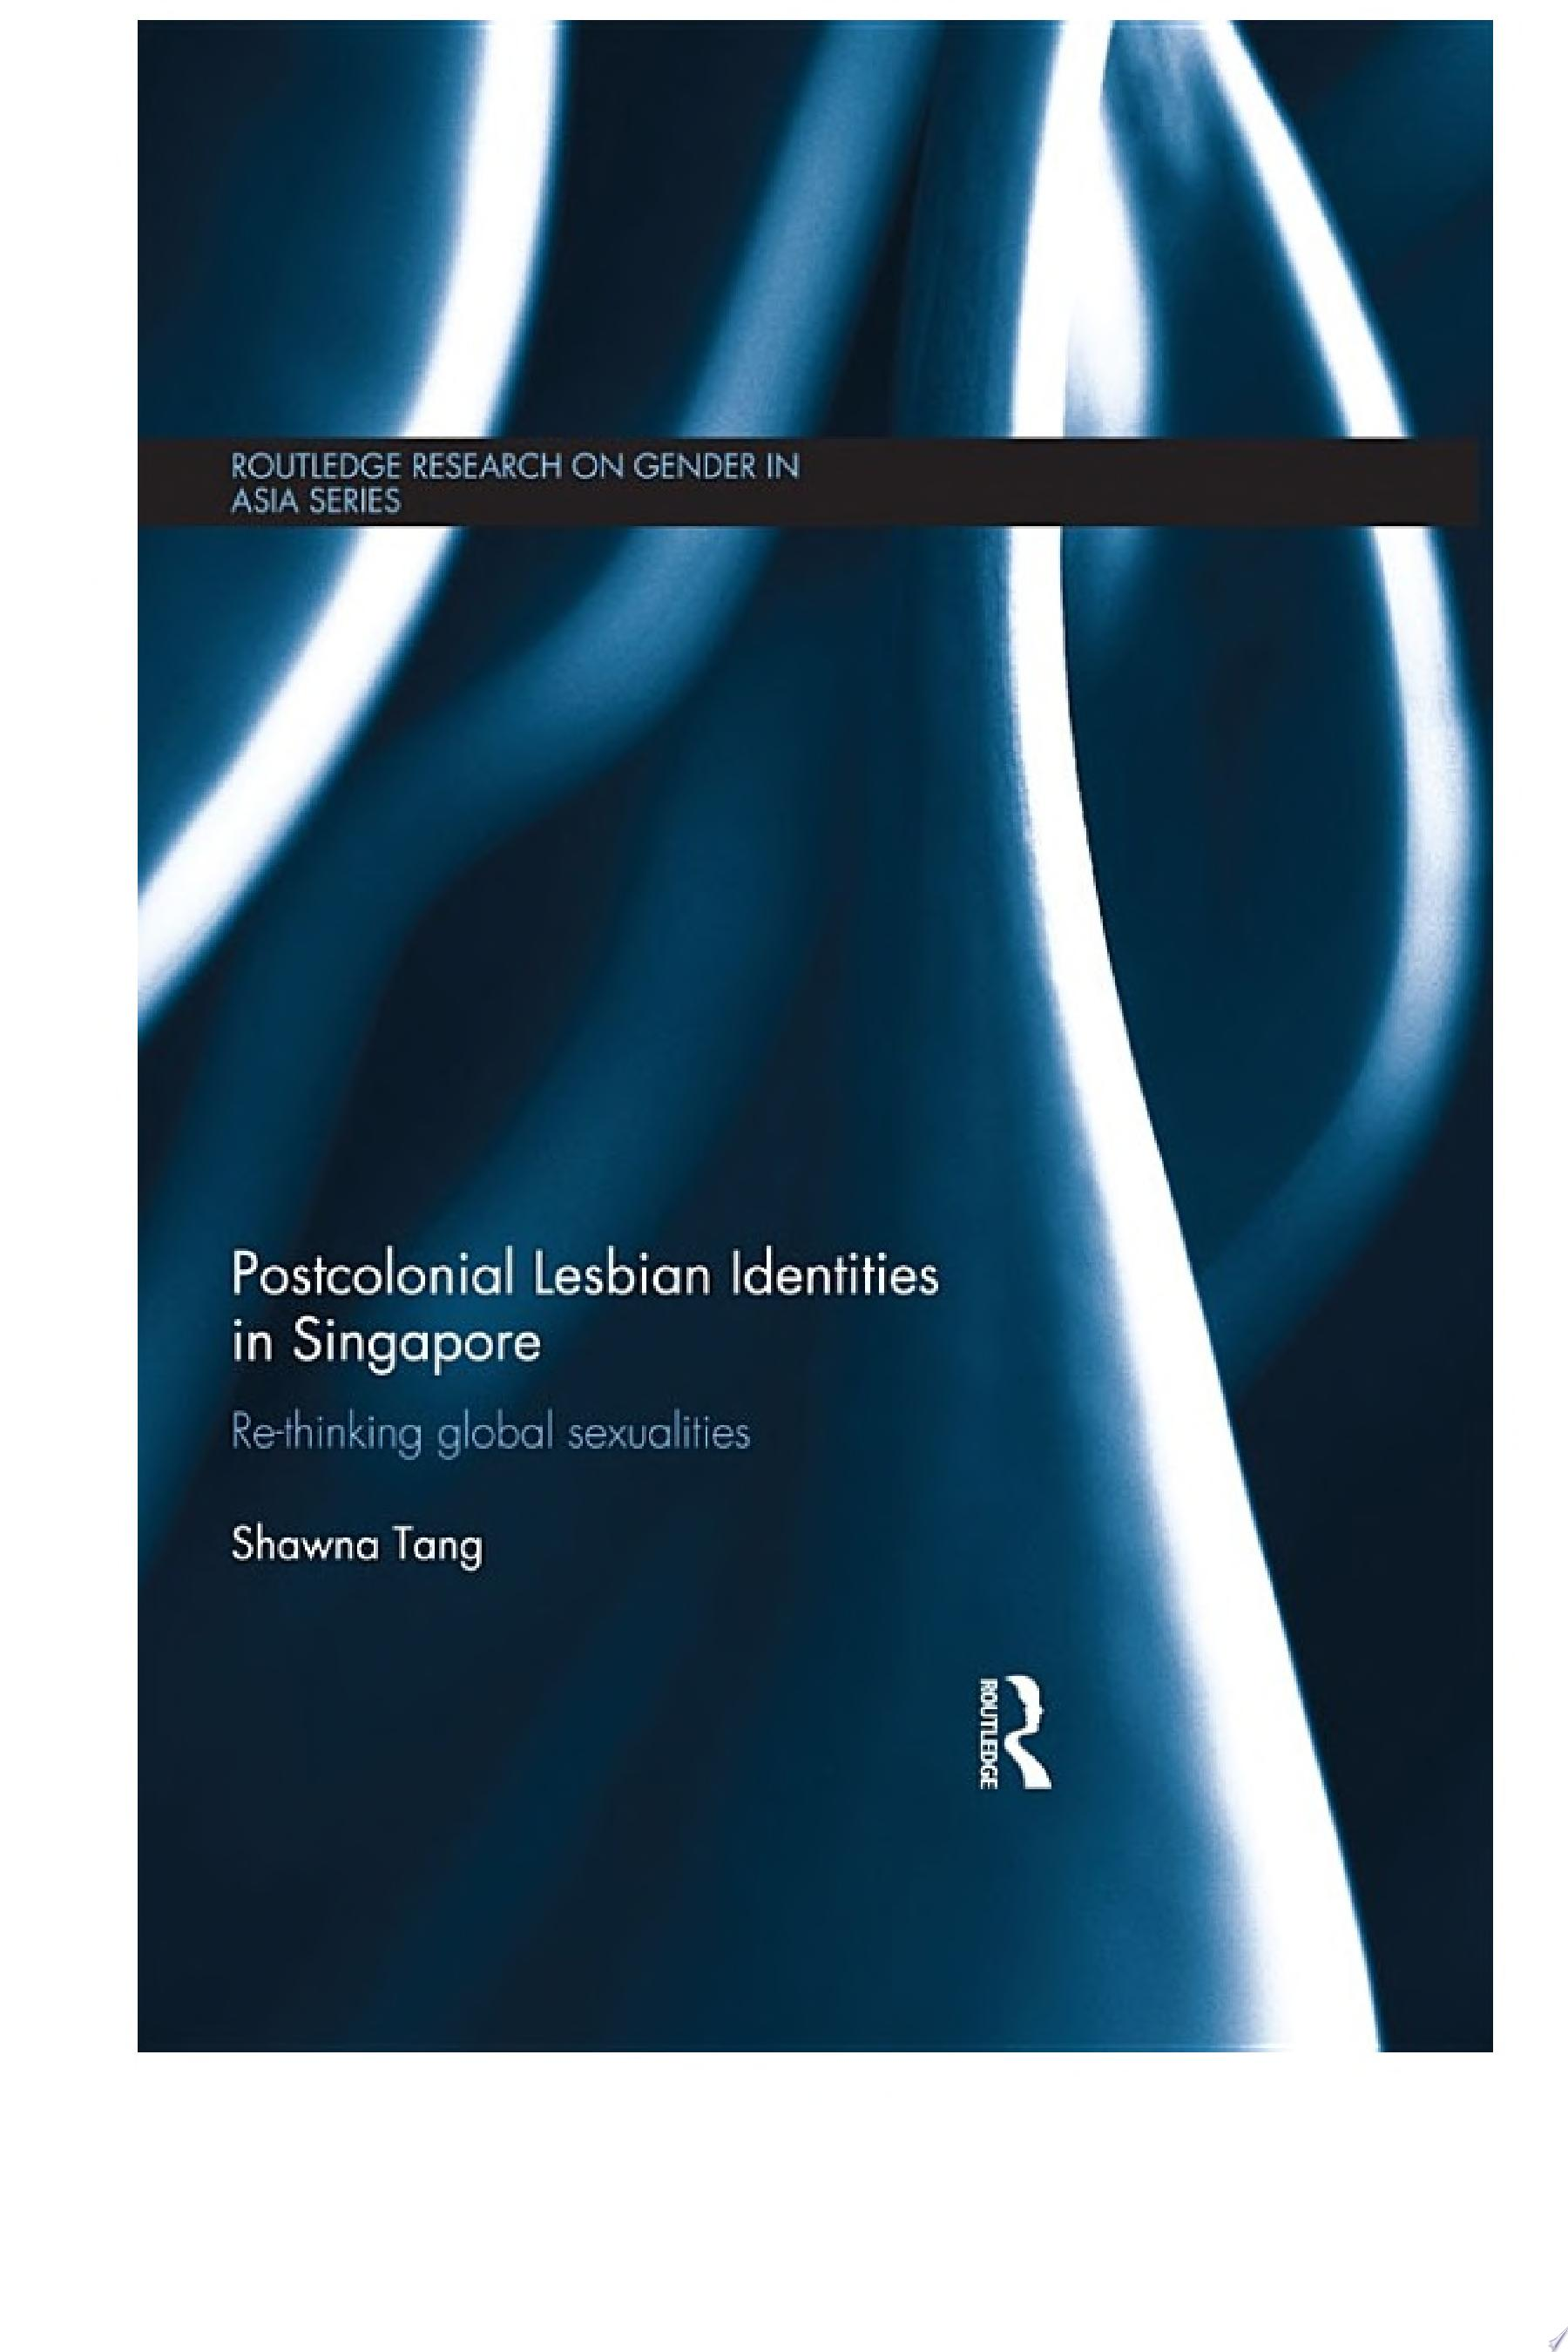 Postcolonial Lesbian Identities in Singapore